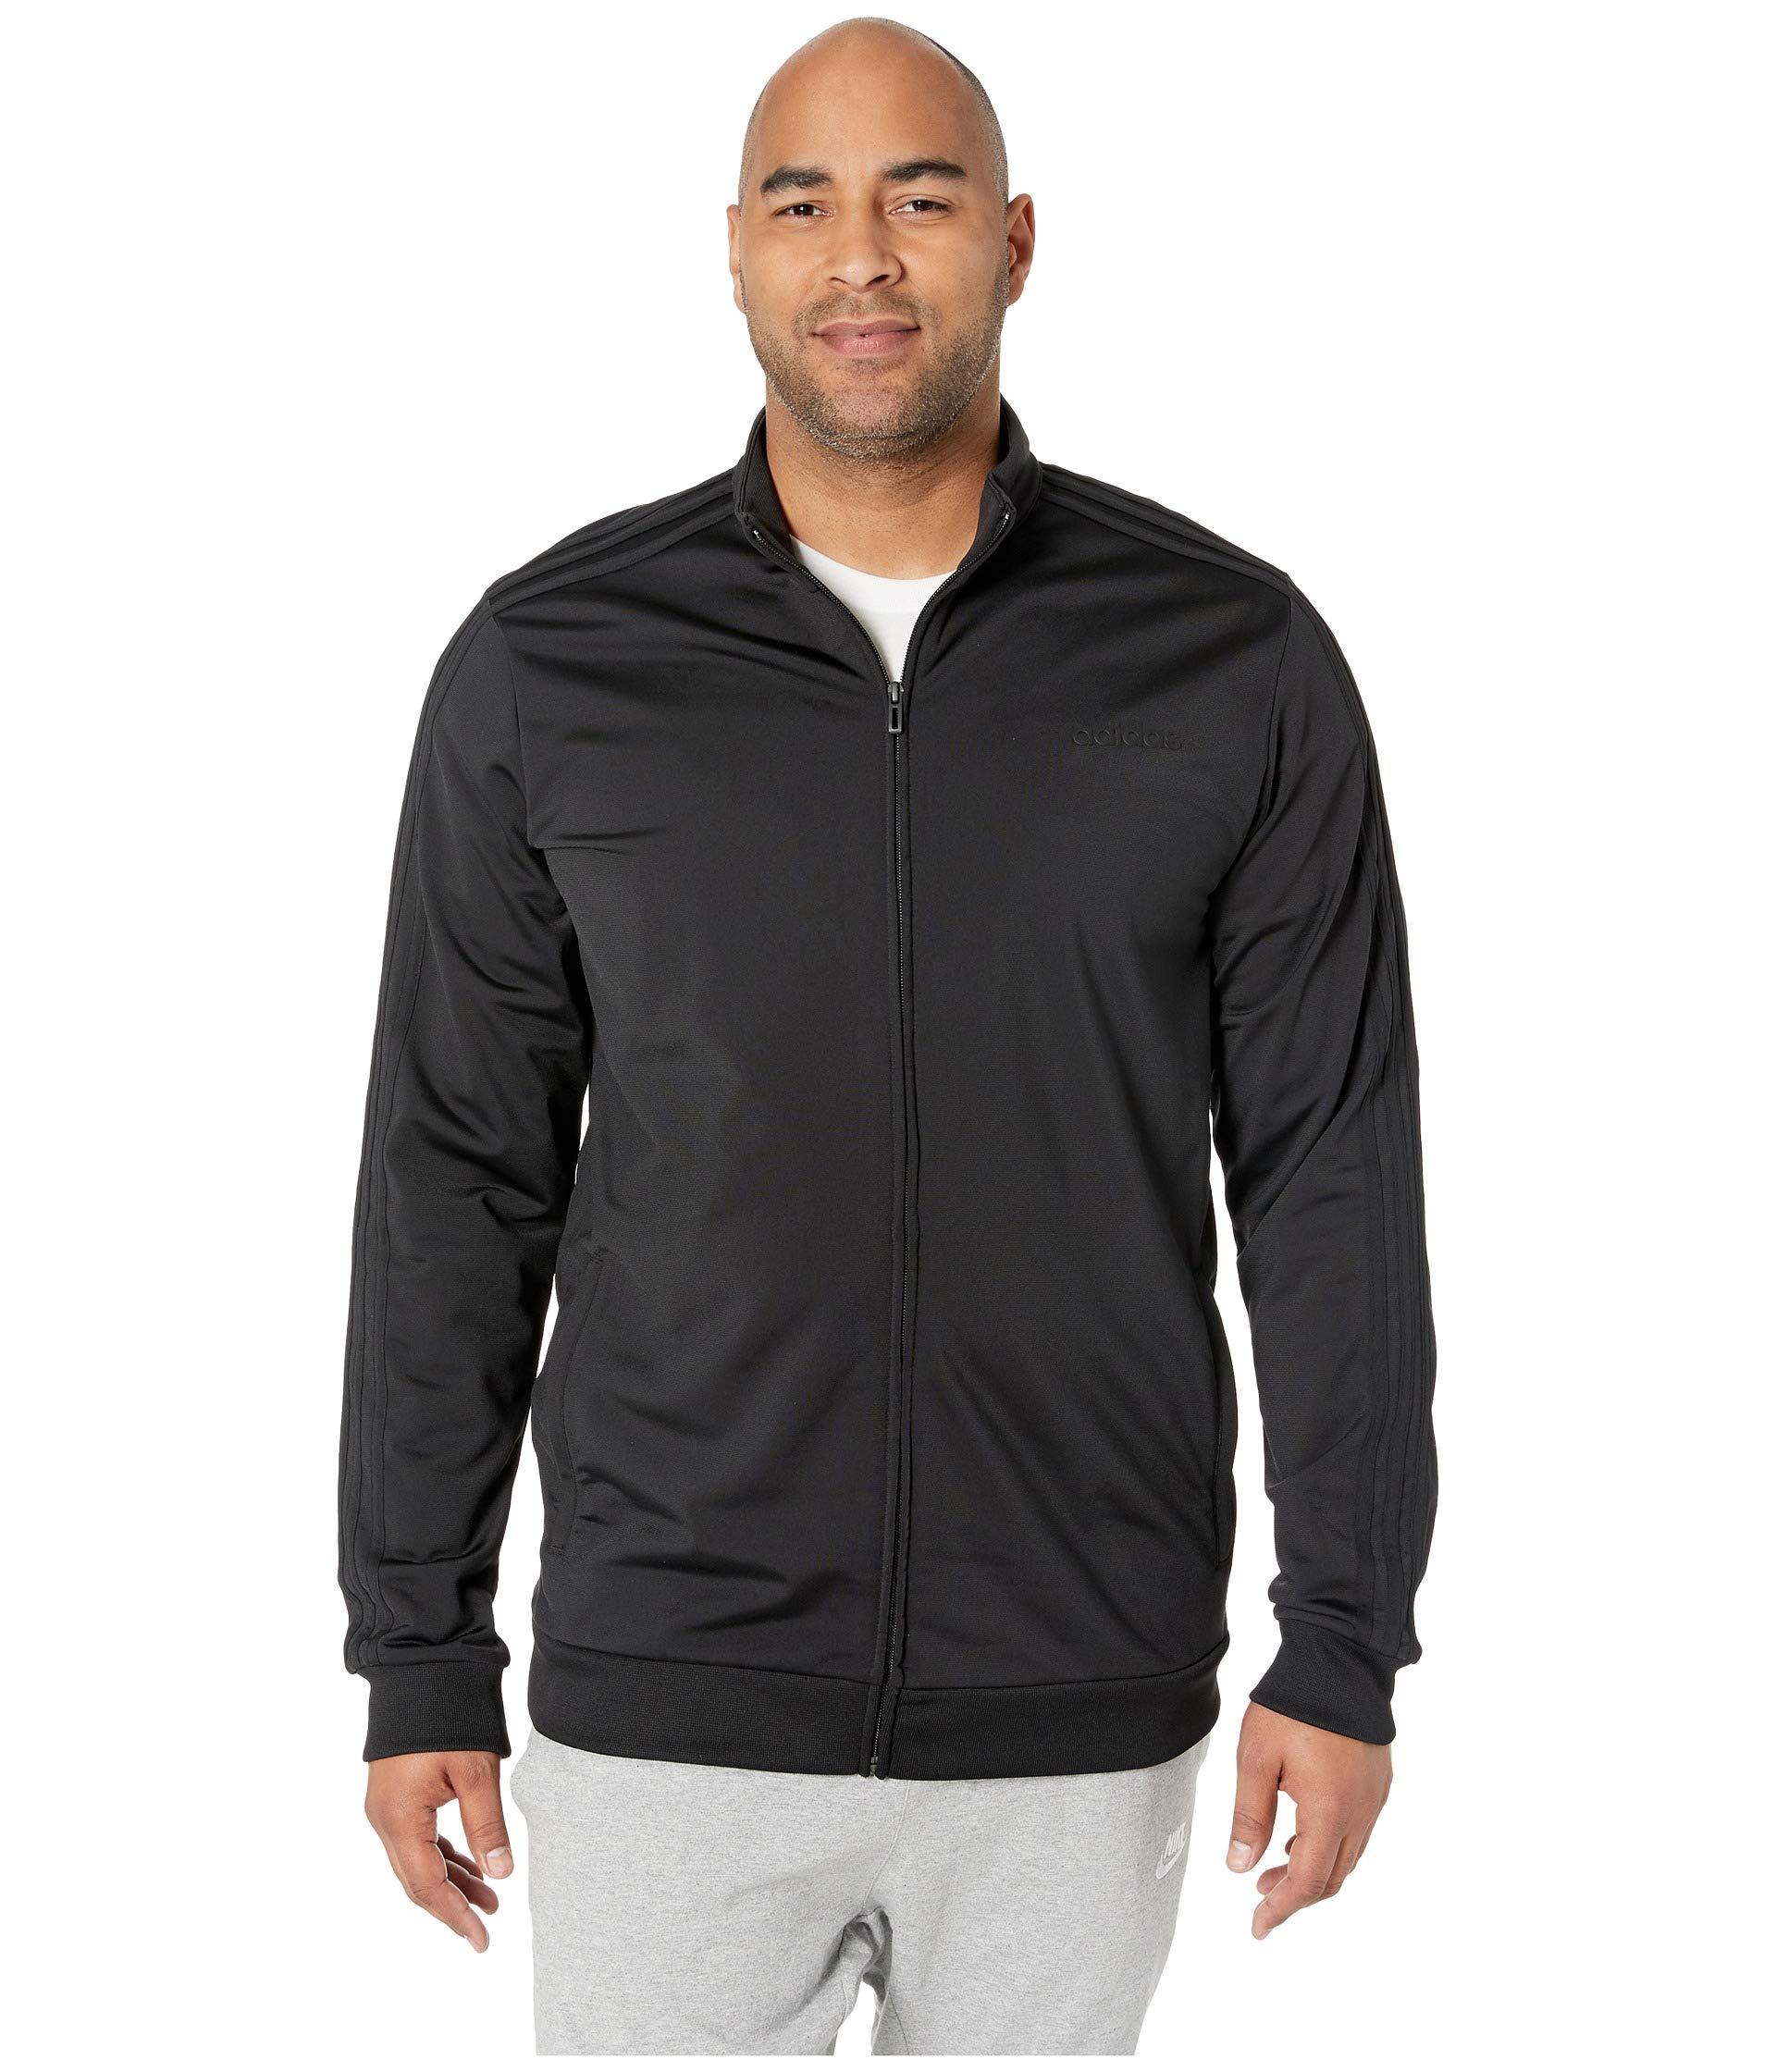 adidas Essentials Men's 3-Stripes Tricot Track Jacket, Black/Black, 4XLT by adidas